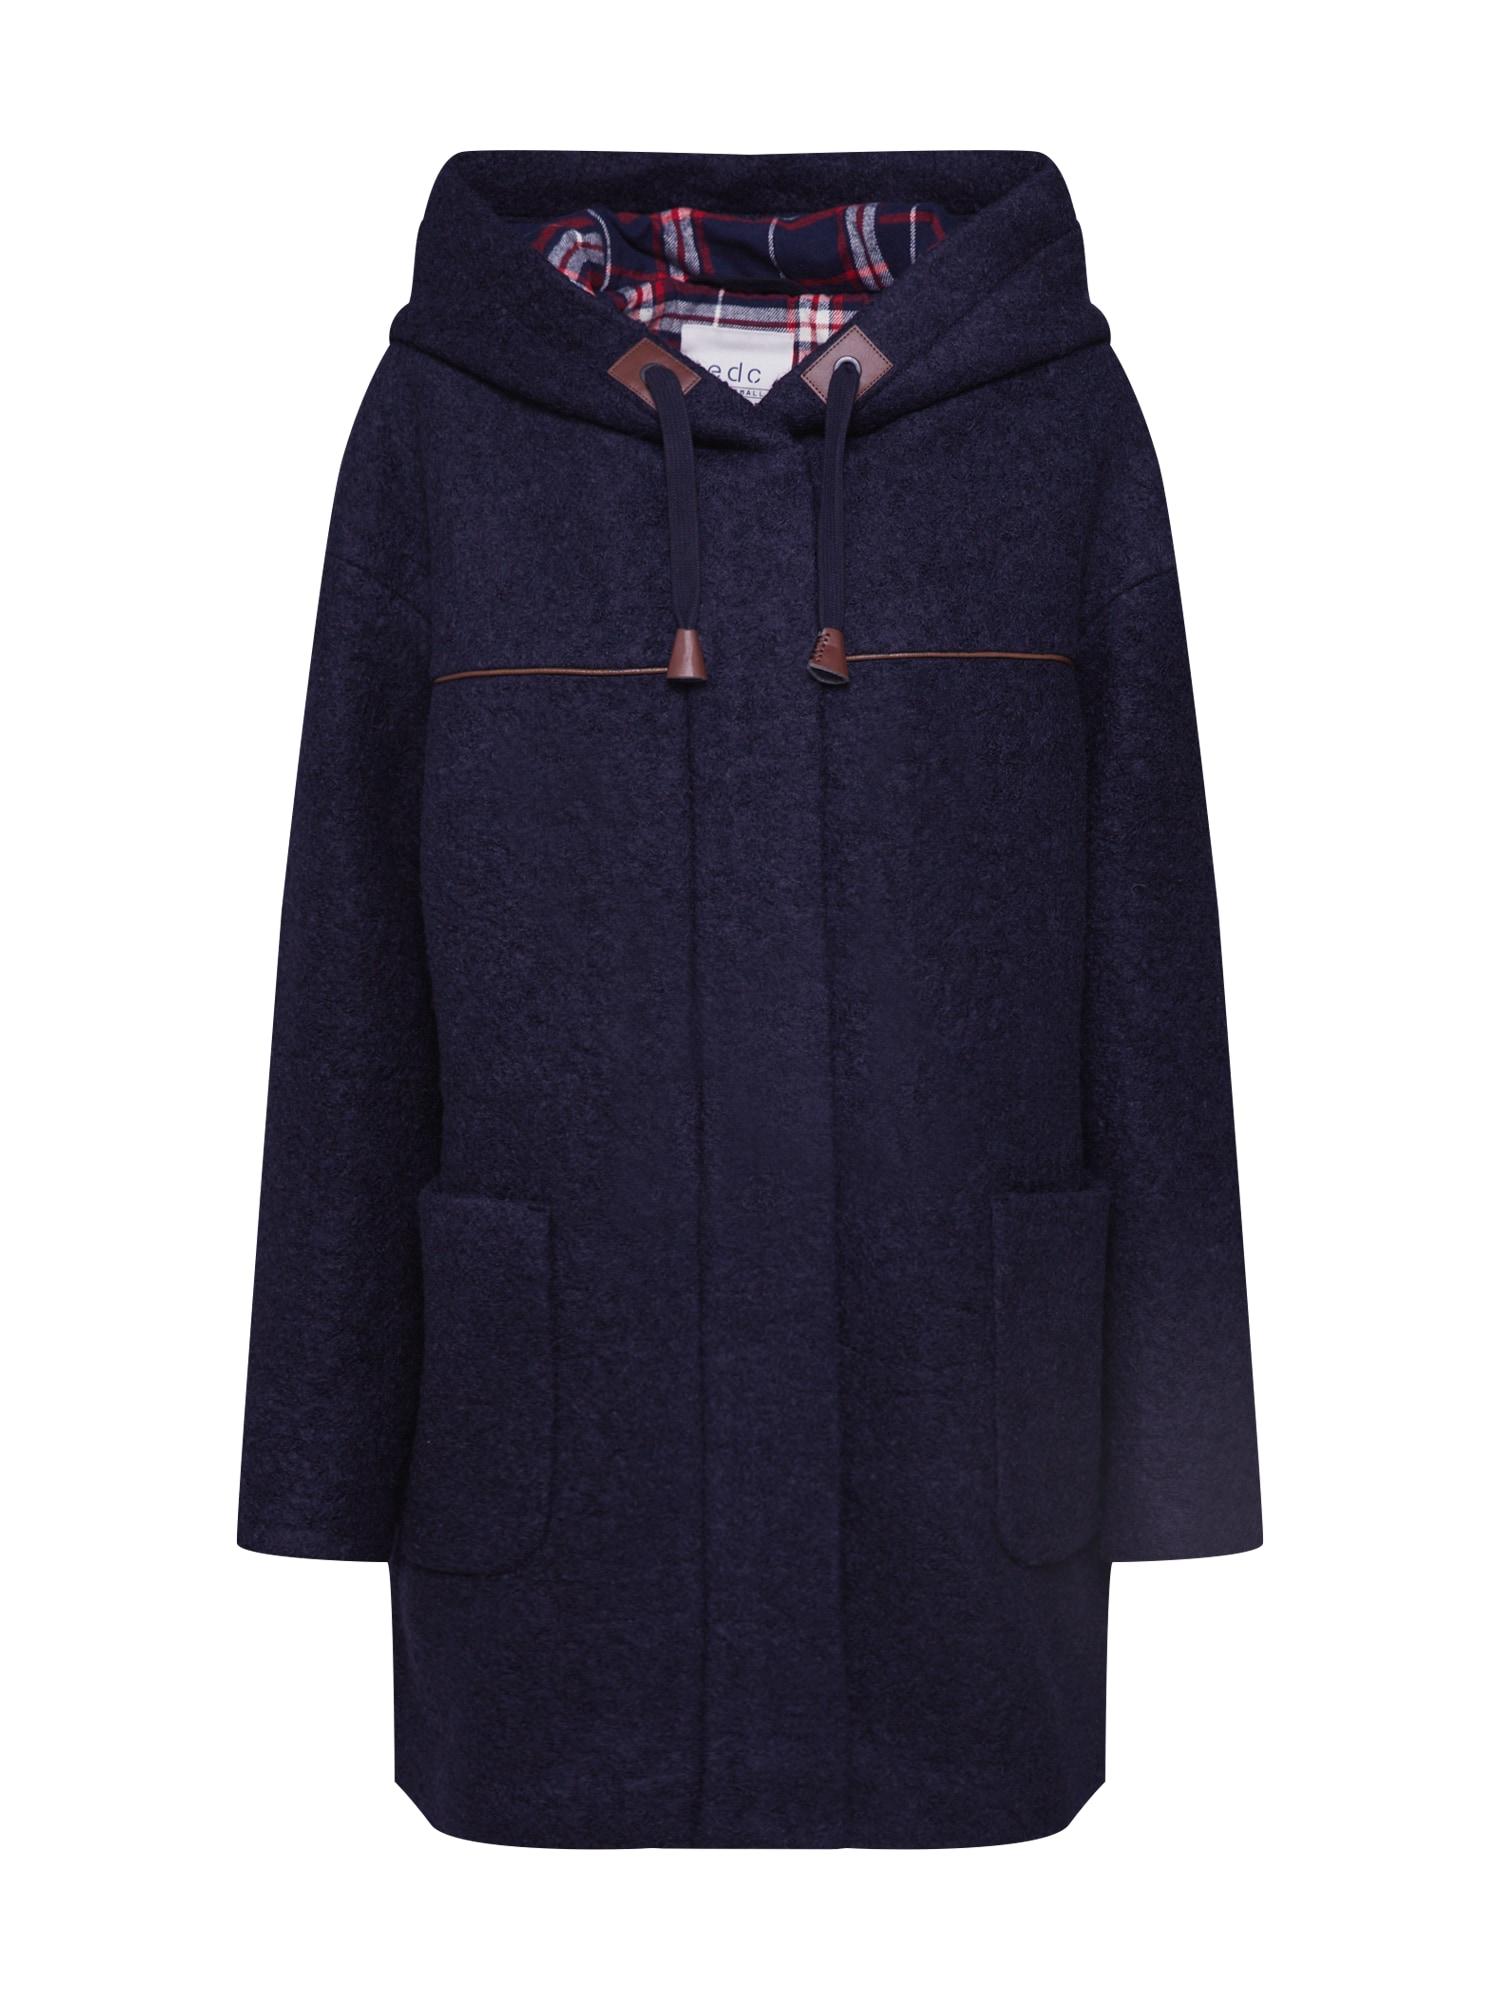 EDC BY ESPRIT Rudeninis-žieminis paltas 'Duffle Coat' tamsiai mėlyna